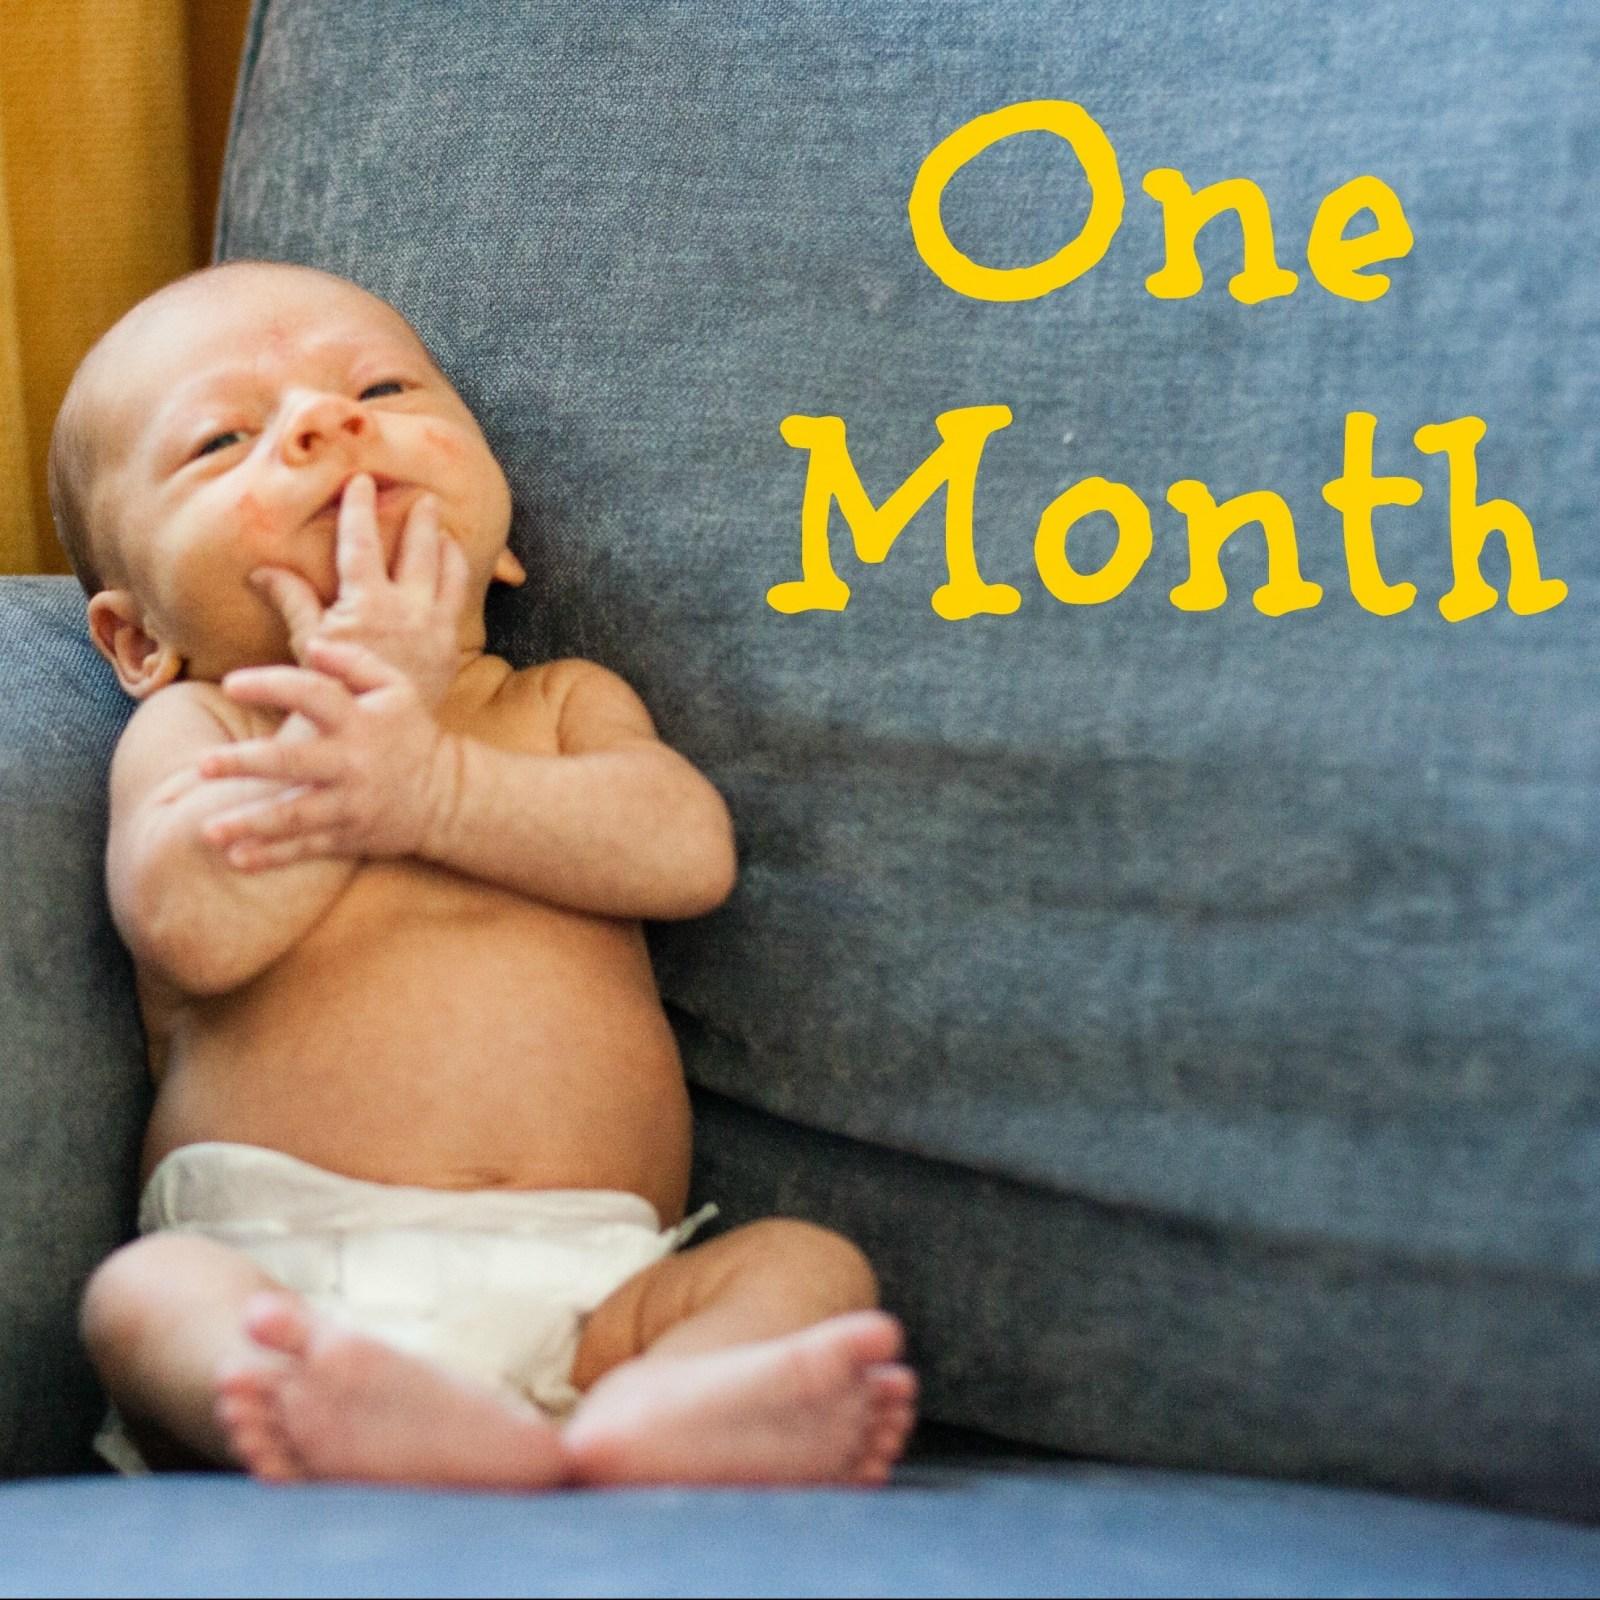 Charleston Michael: One Month